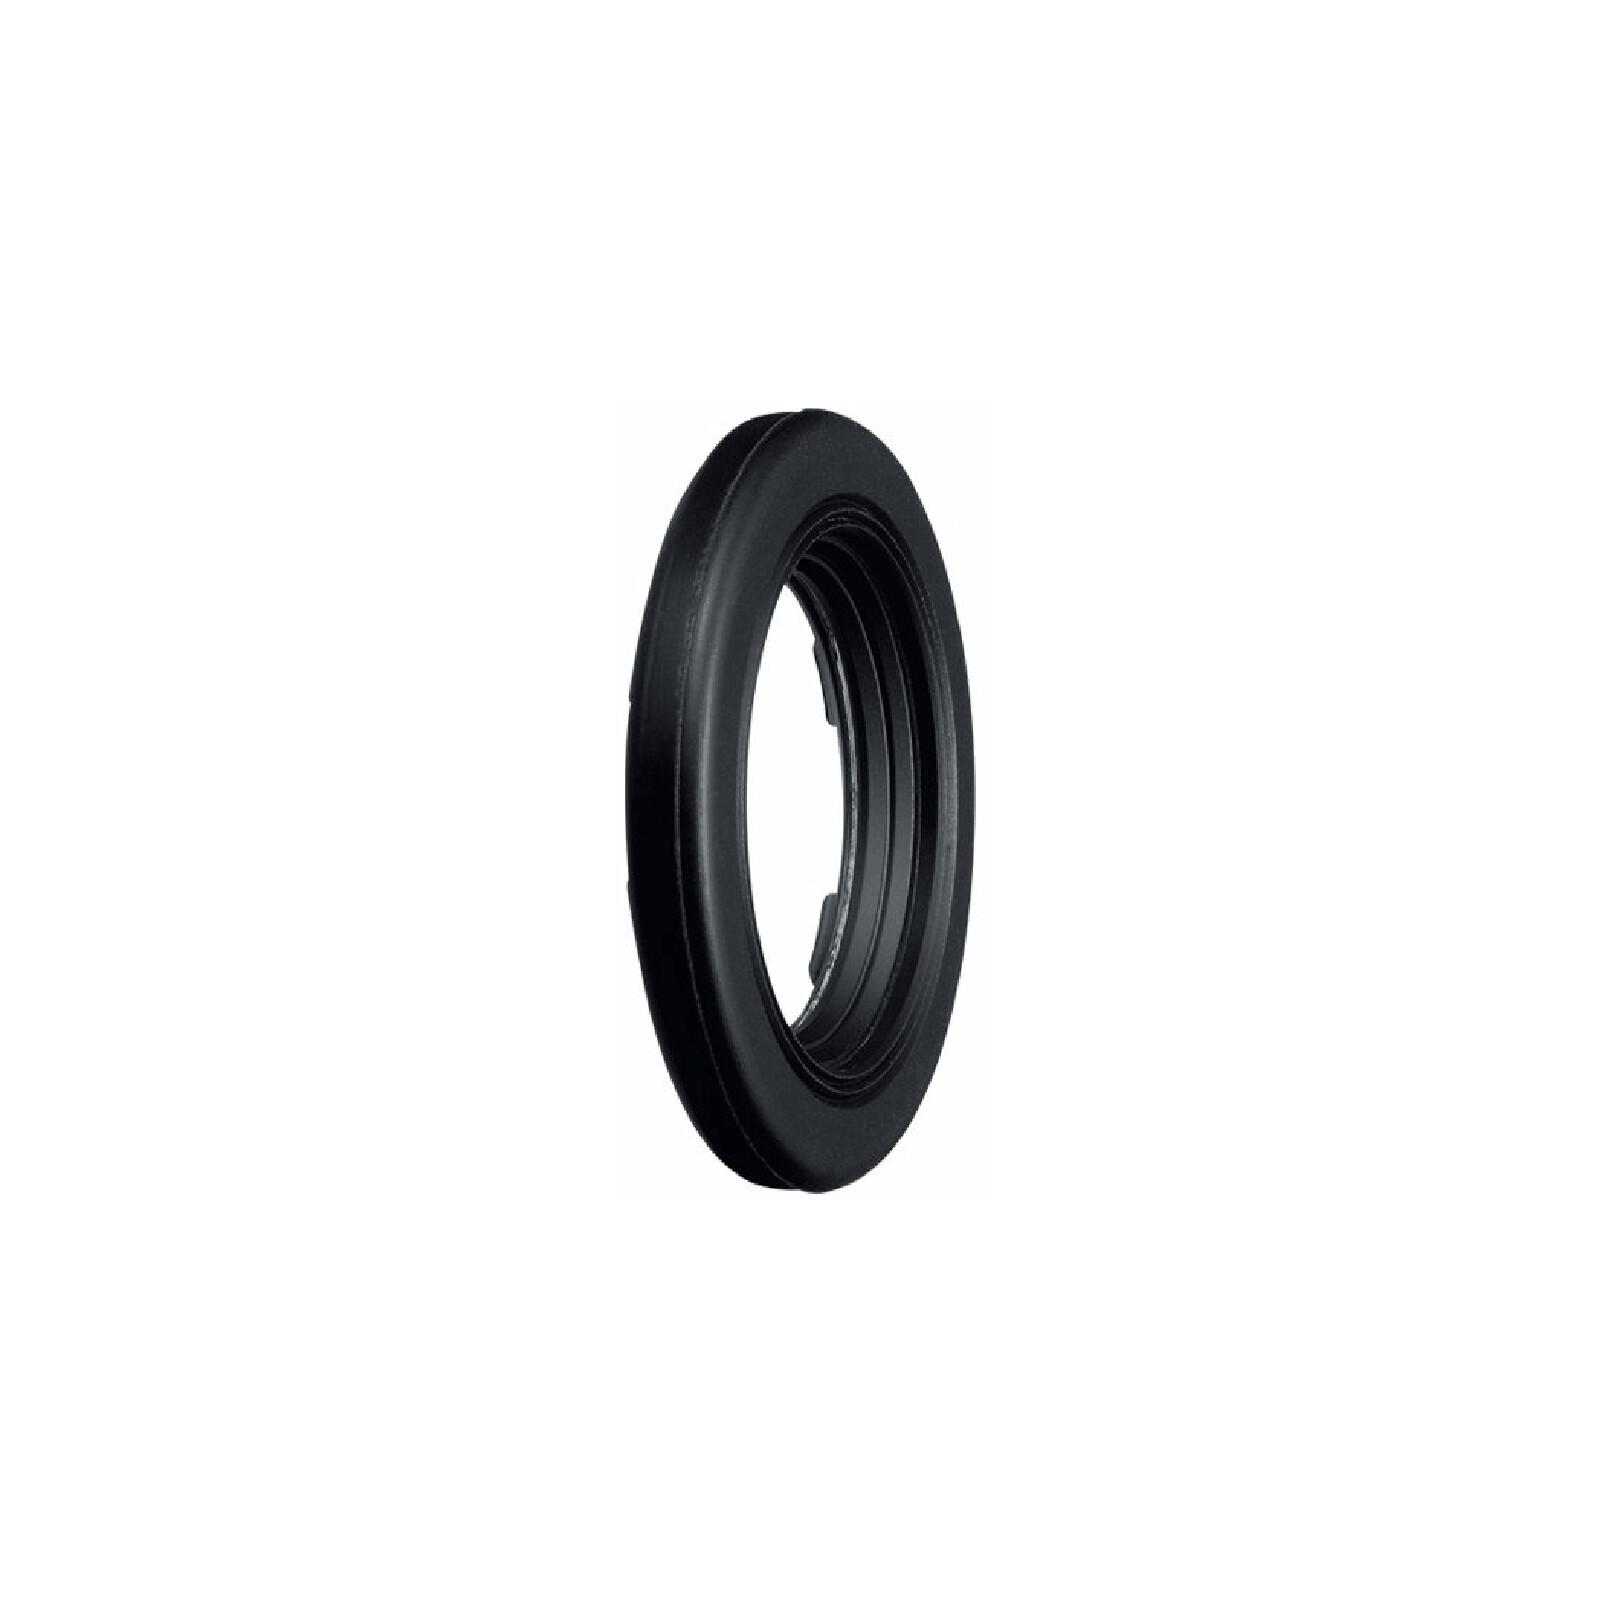 Nikon DK-17C +2 Korrekturlinse